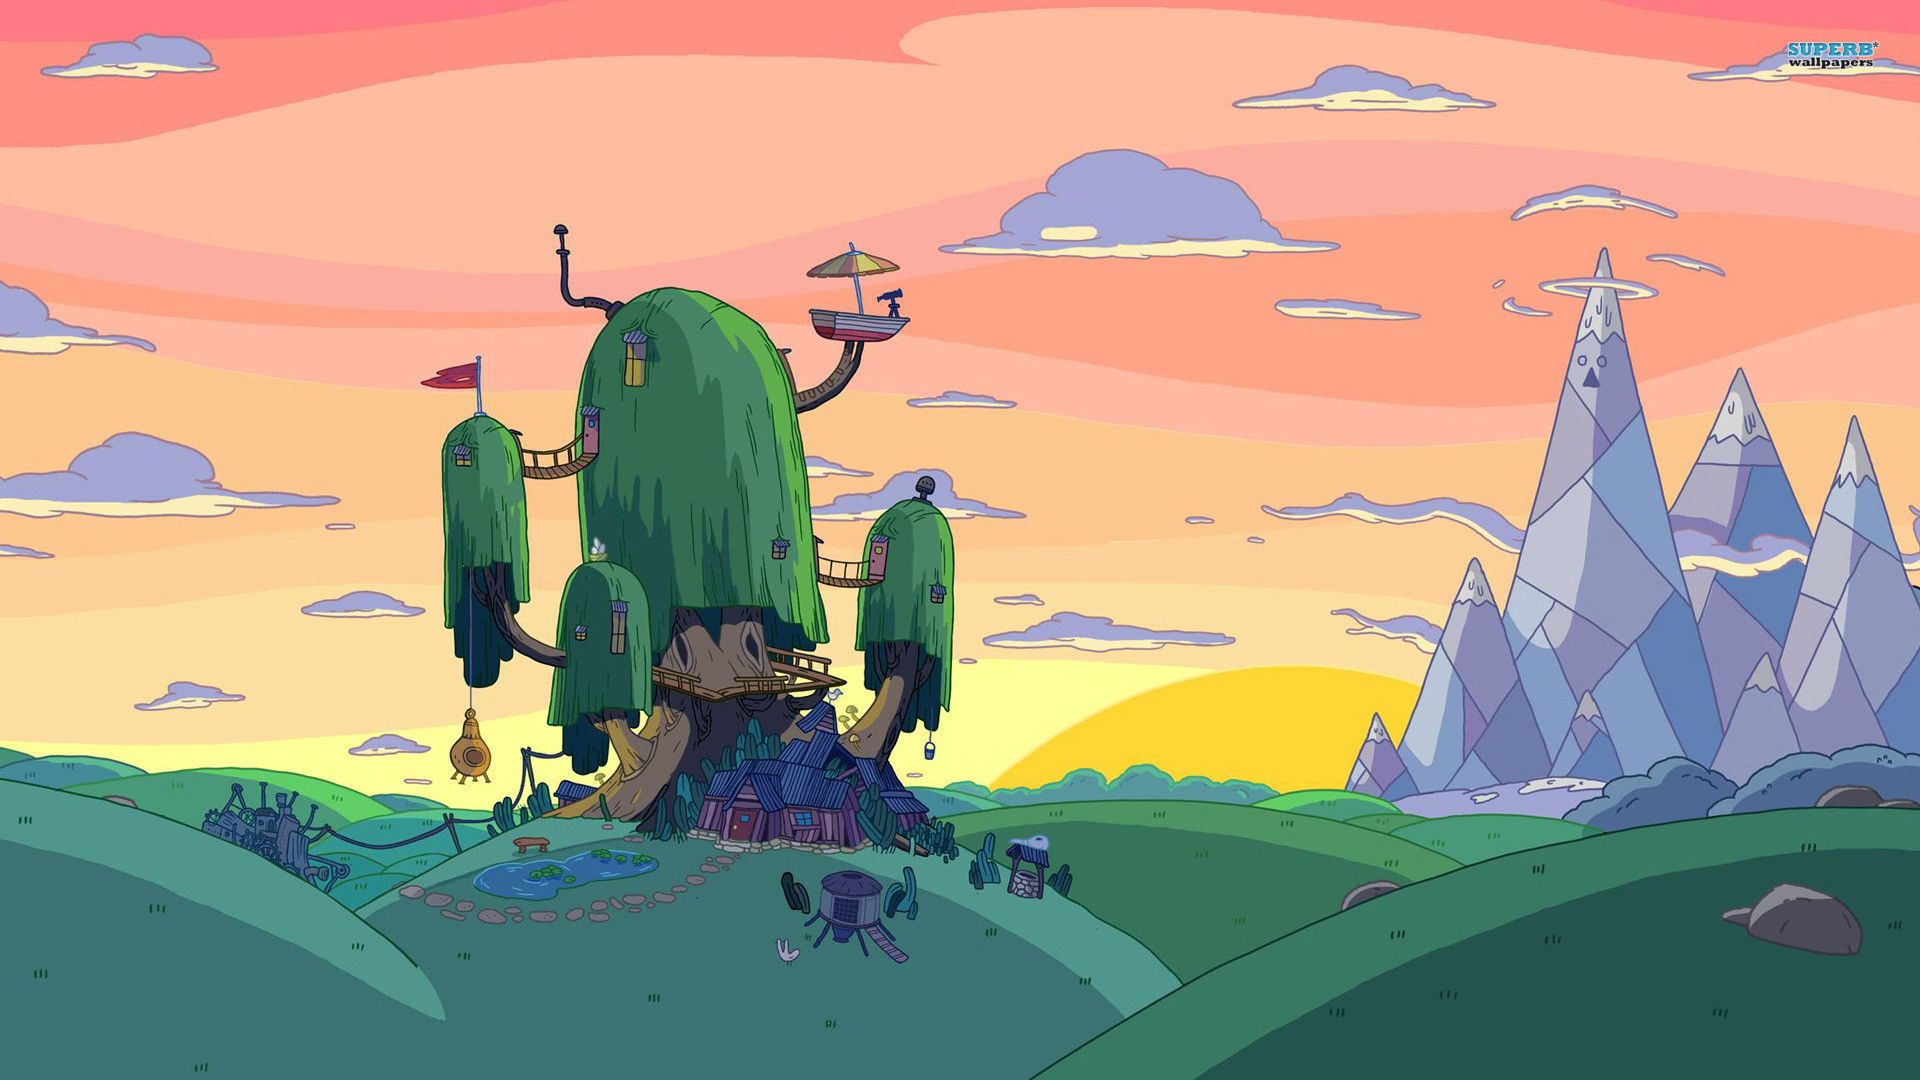 Adventure Time Environment Art Adventure time wallpaper 1920x1080